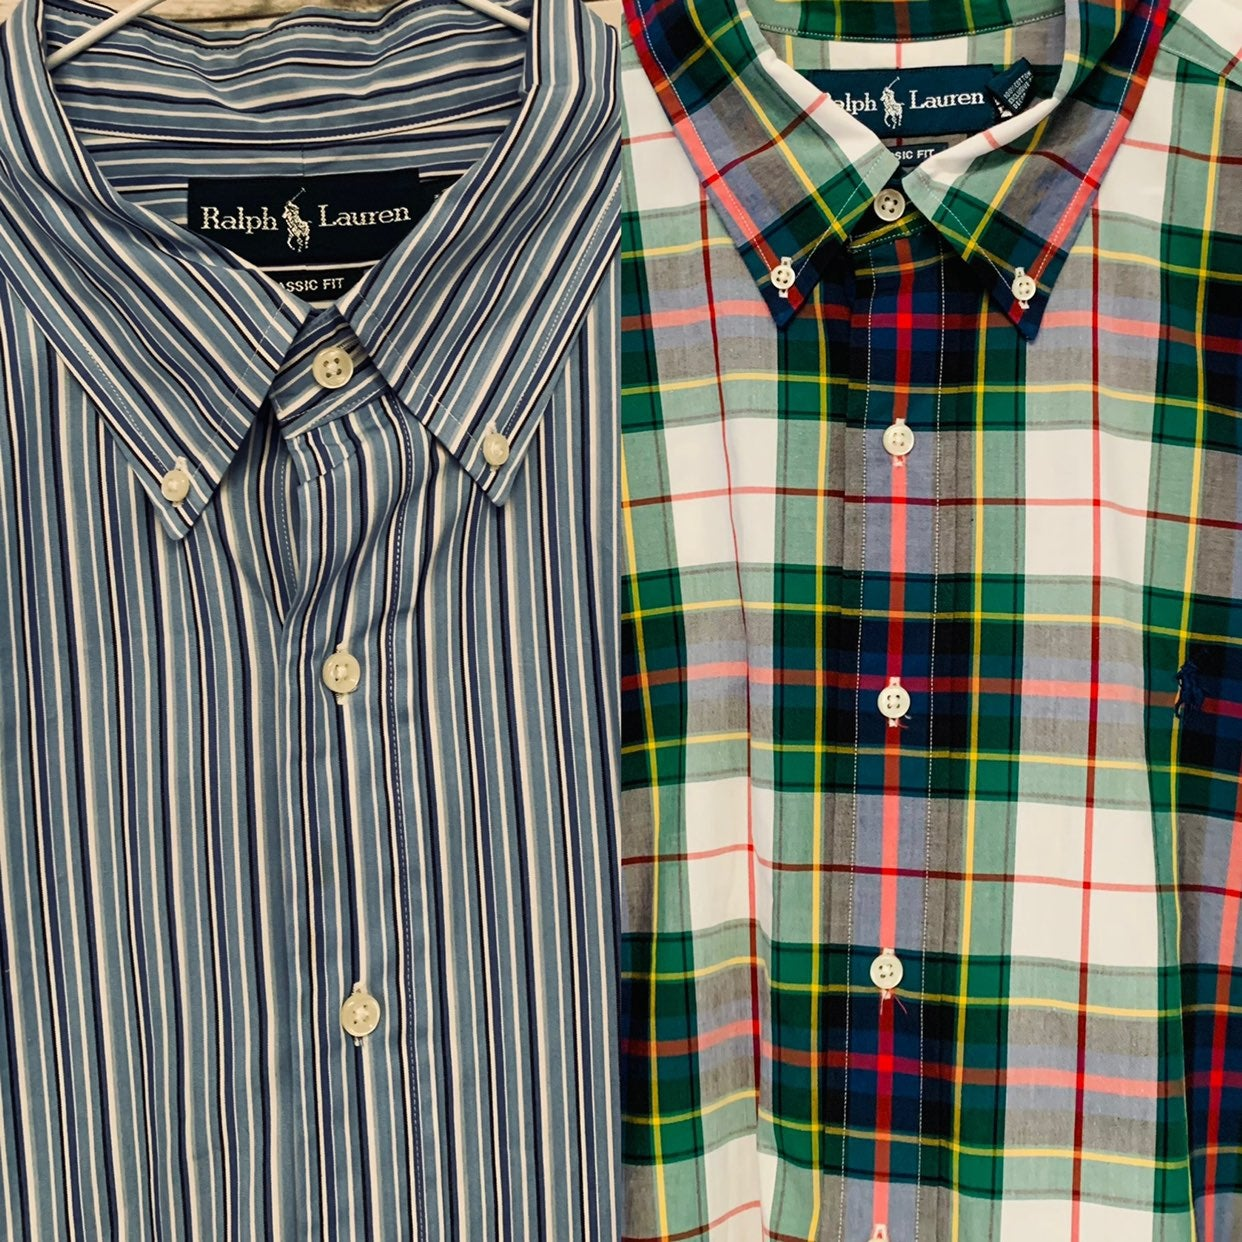 2 ralph lauren classic fit shirts XL